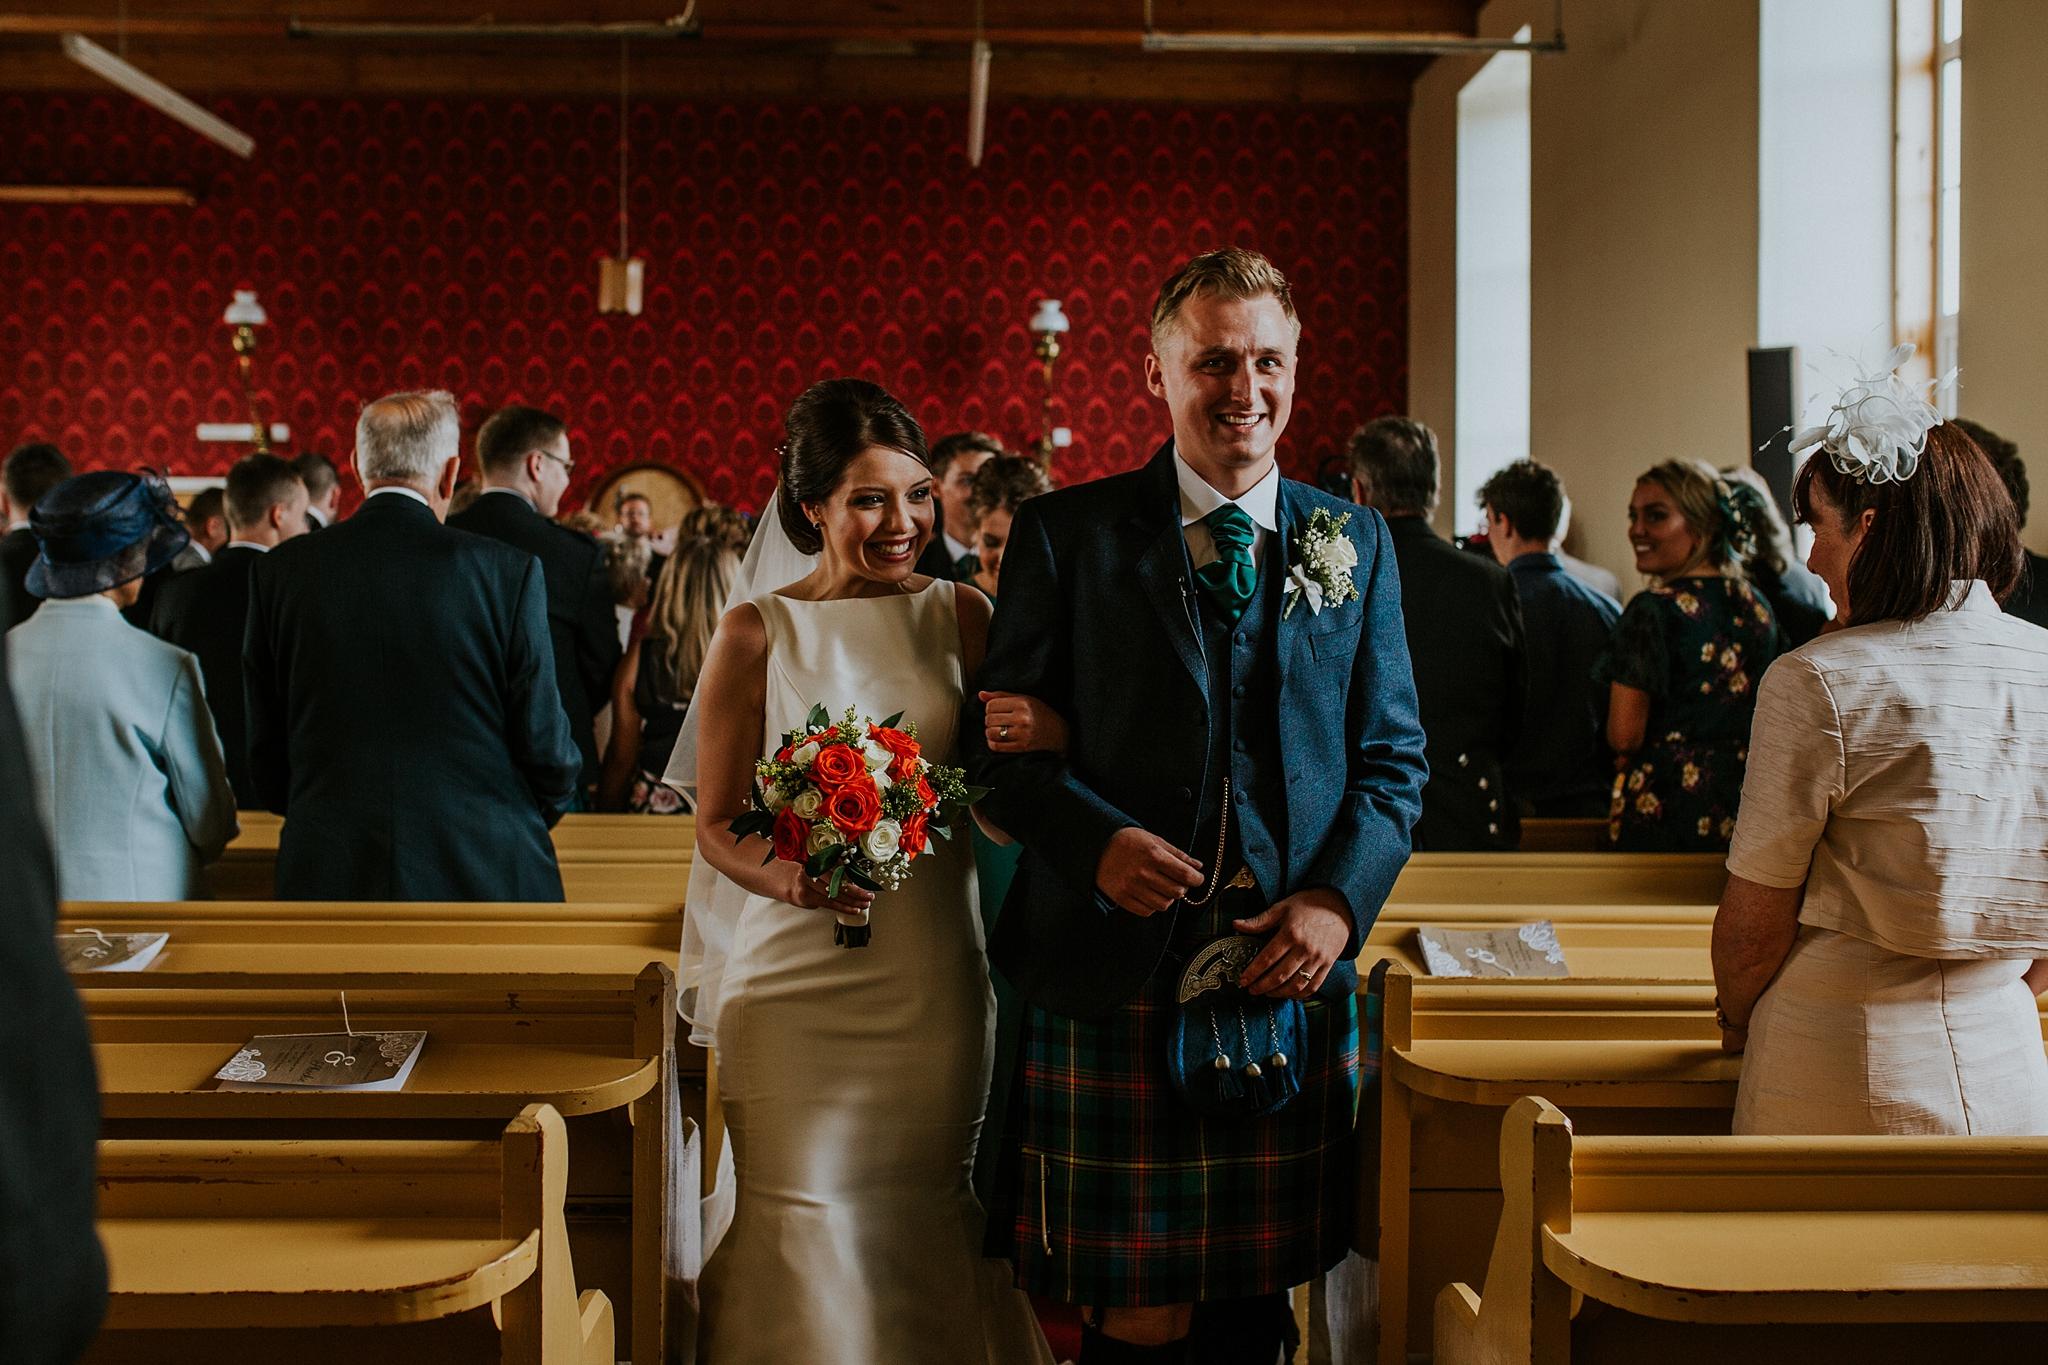 Linda&Shockie_northuist_wedding_photographer-25.JPG